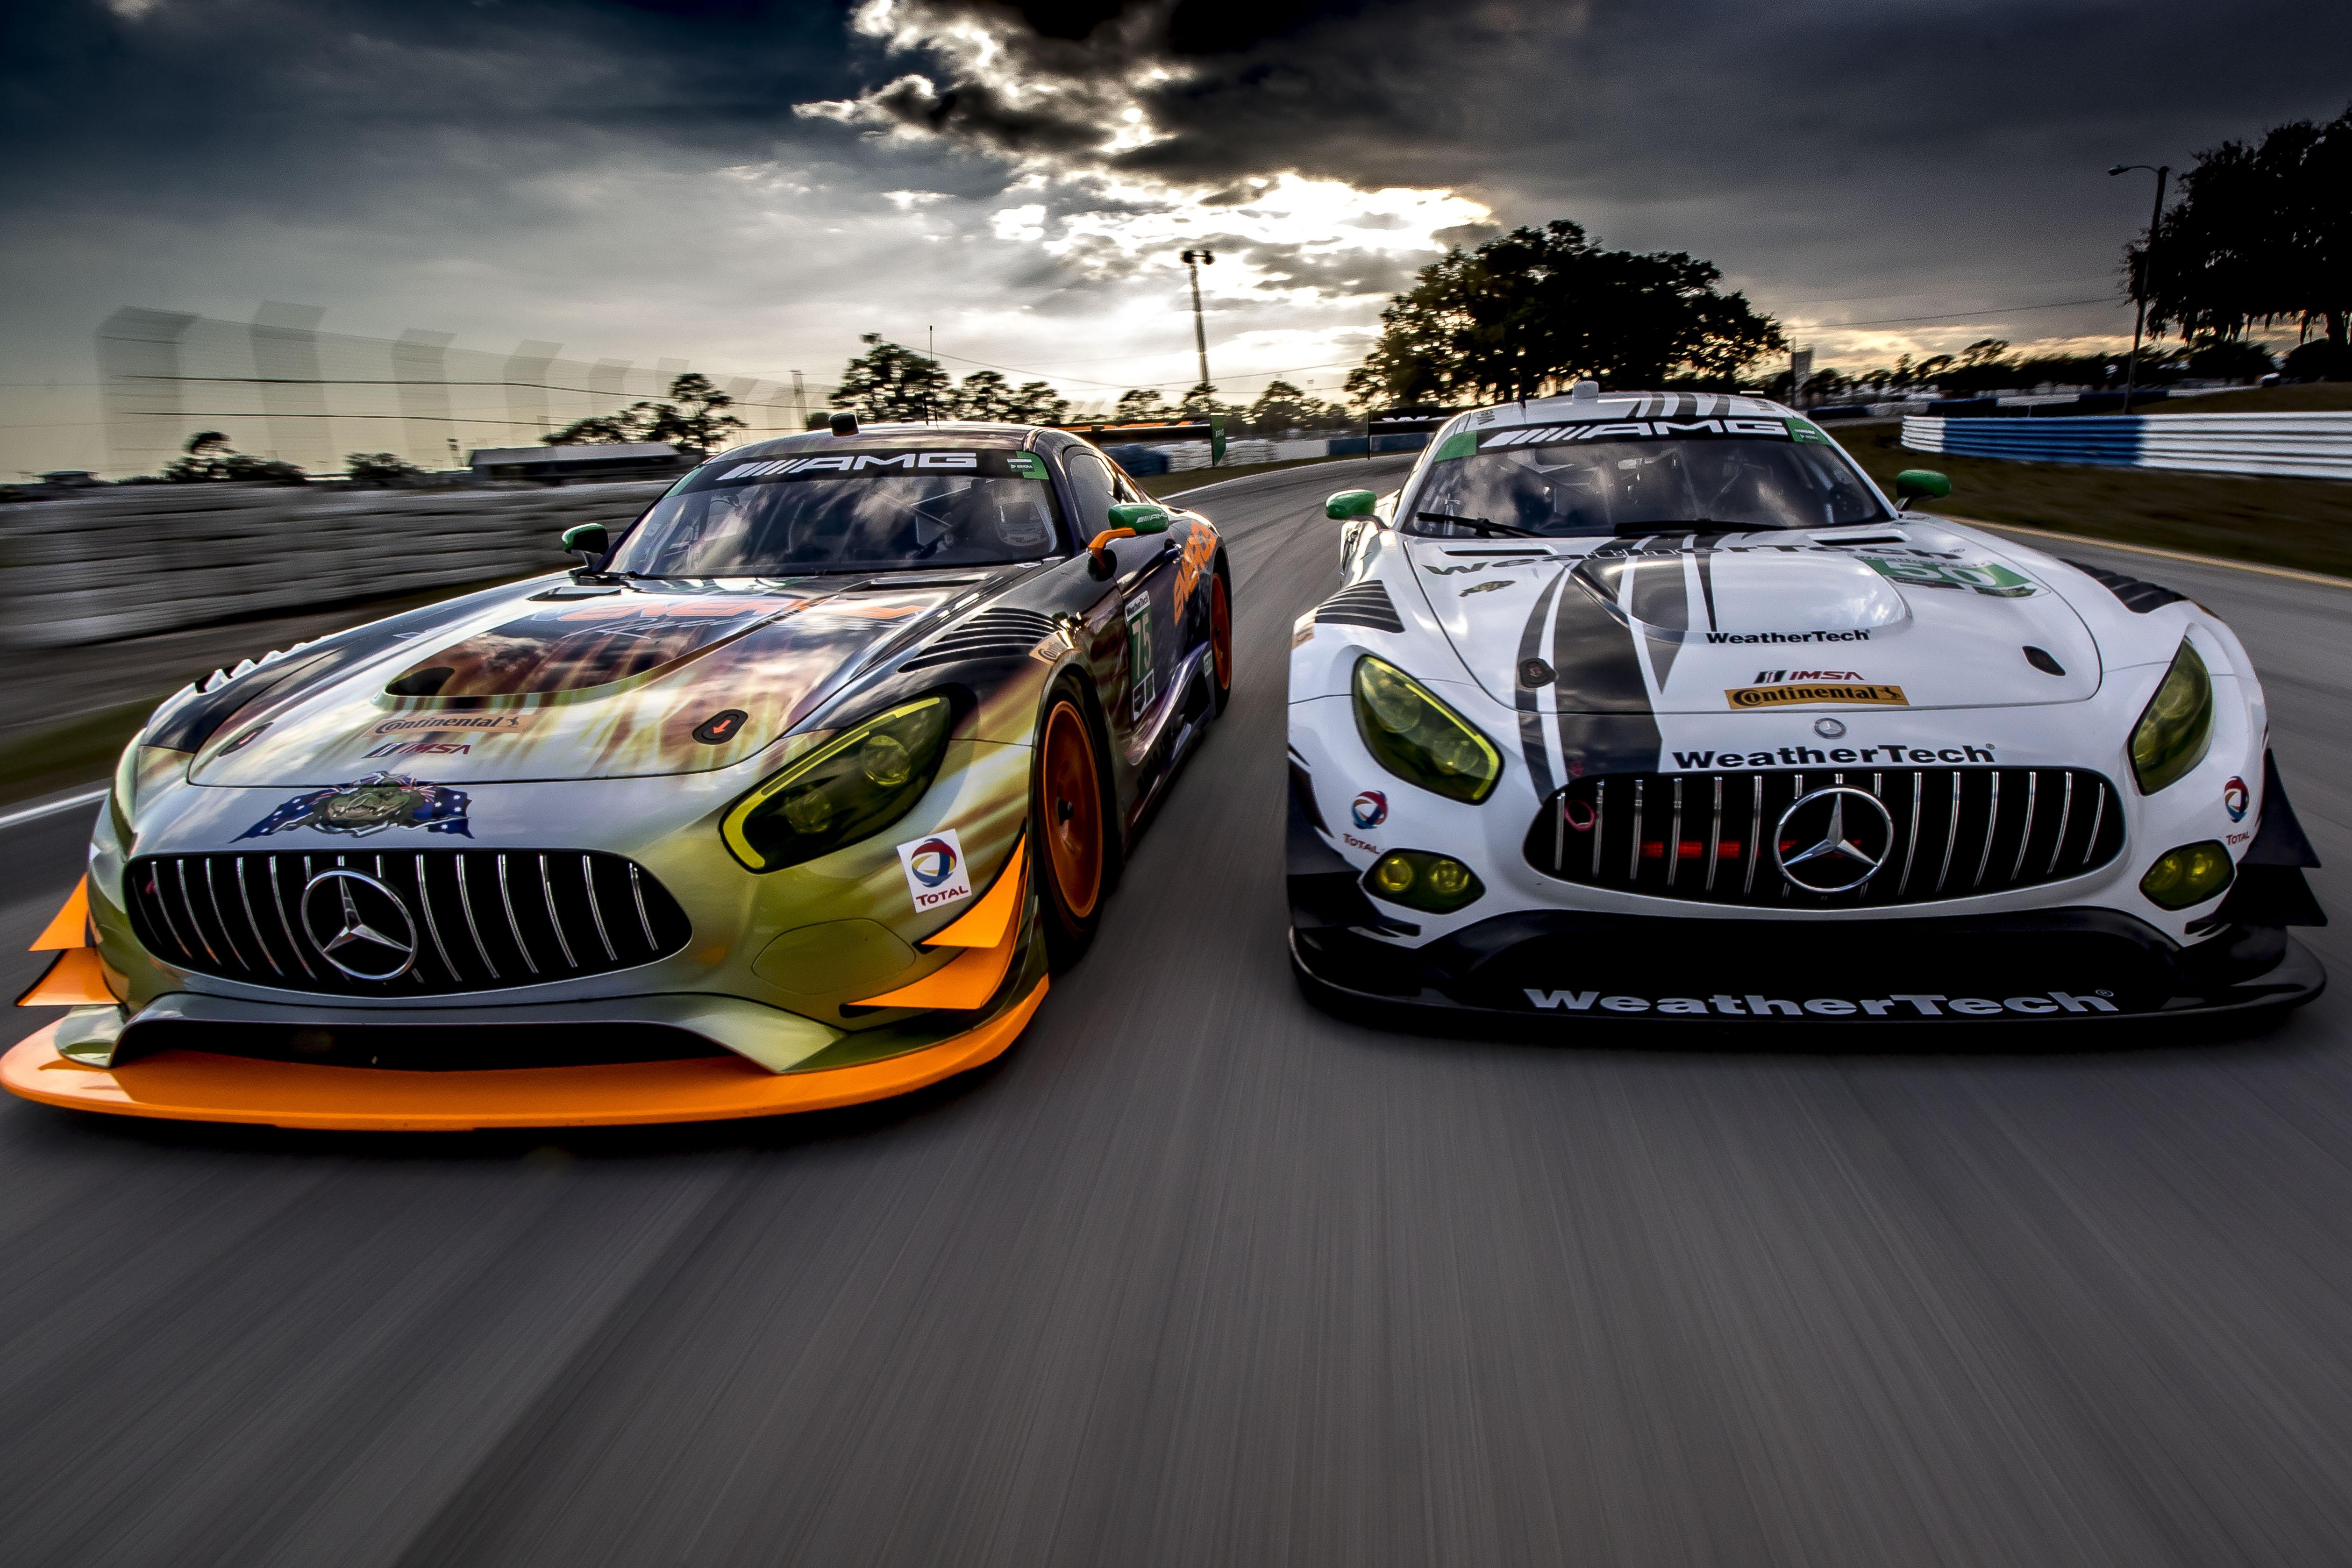 2017 Sebring Imsa Mercedes Amg Gt3 5K, HD Cars, 4k ...